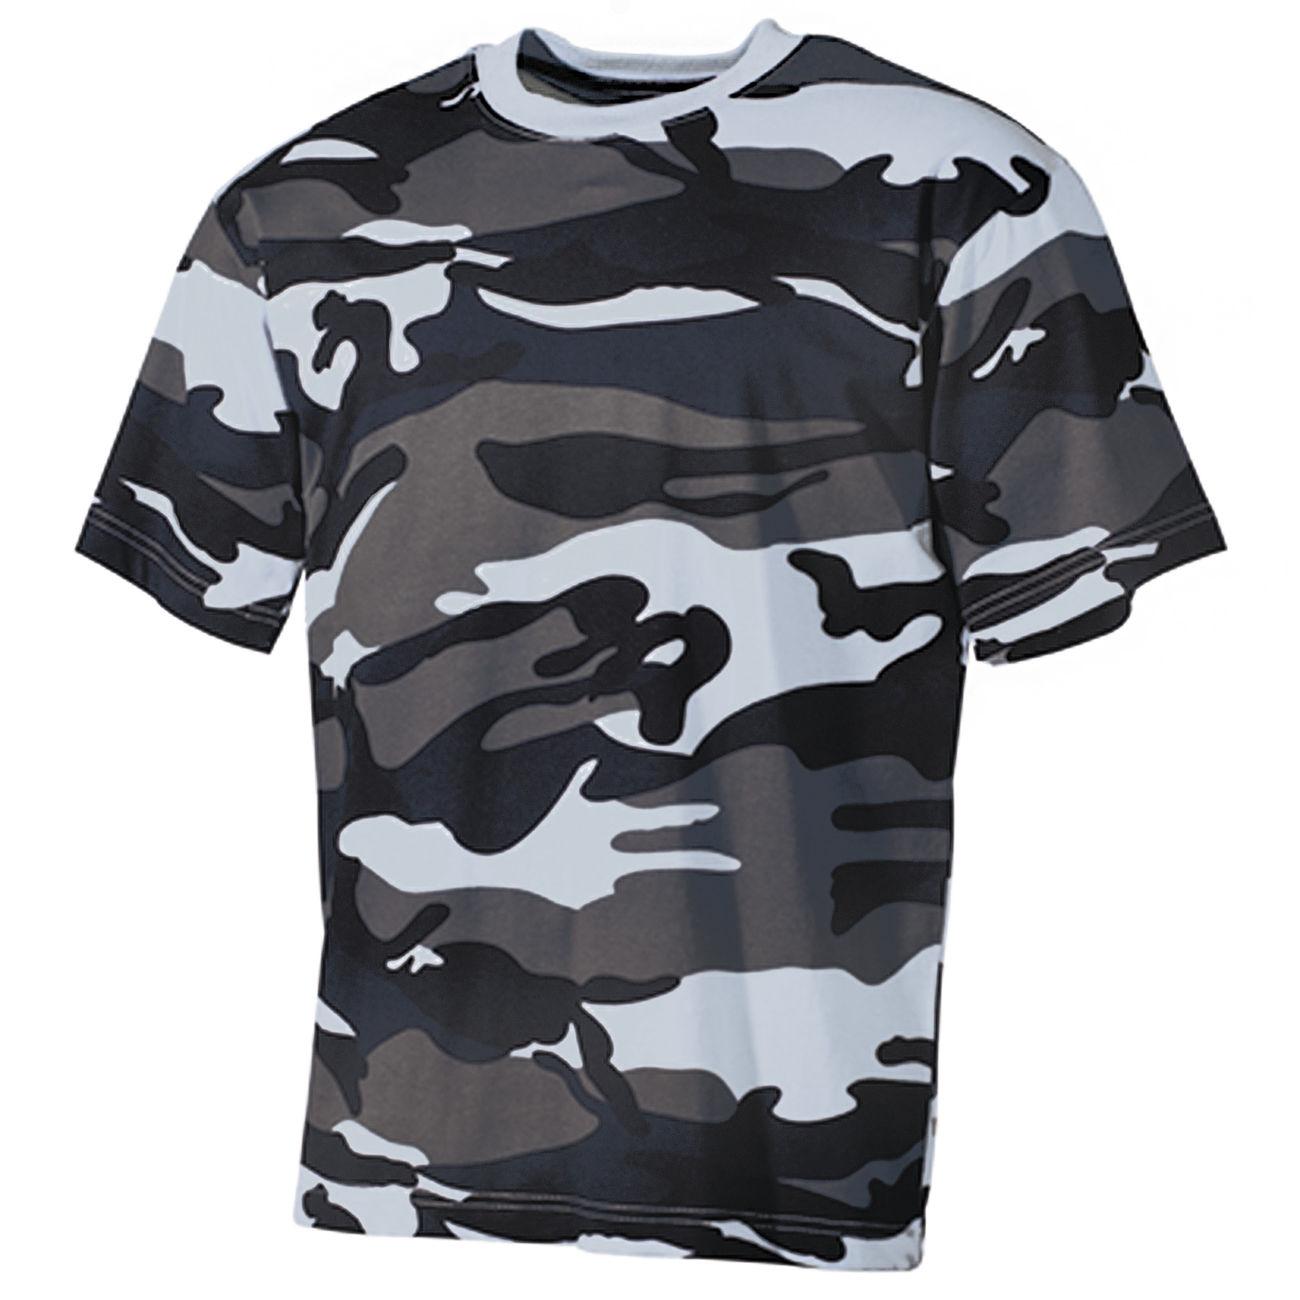 a2dcb9f96bbe50 MFH T-Shirt halbarm sky blue camo günstig kaufen - Kotte & Zeller